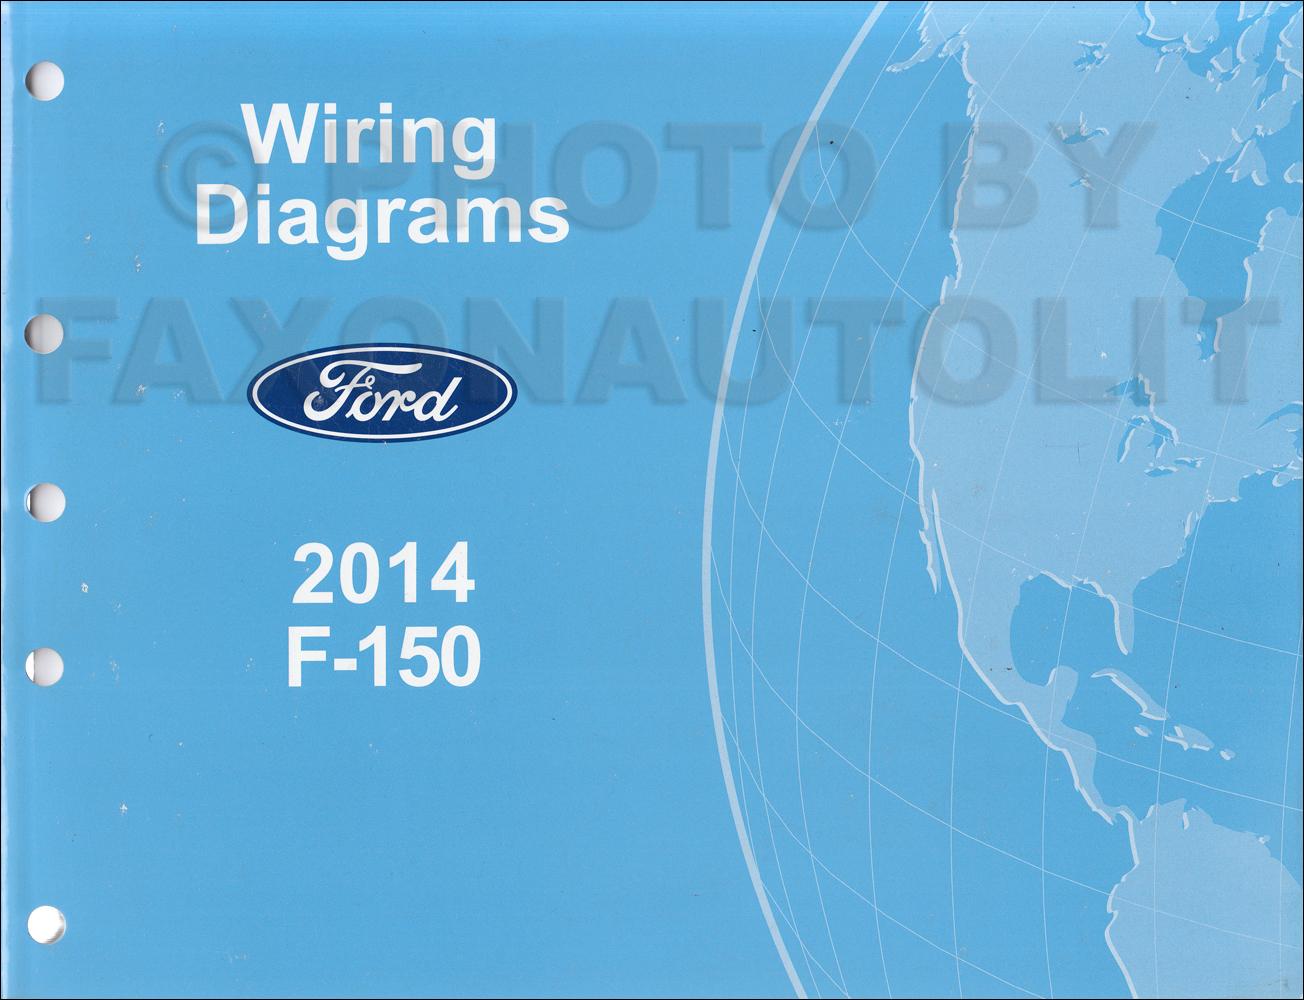 1953 Ford Wiring Diagram